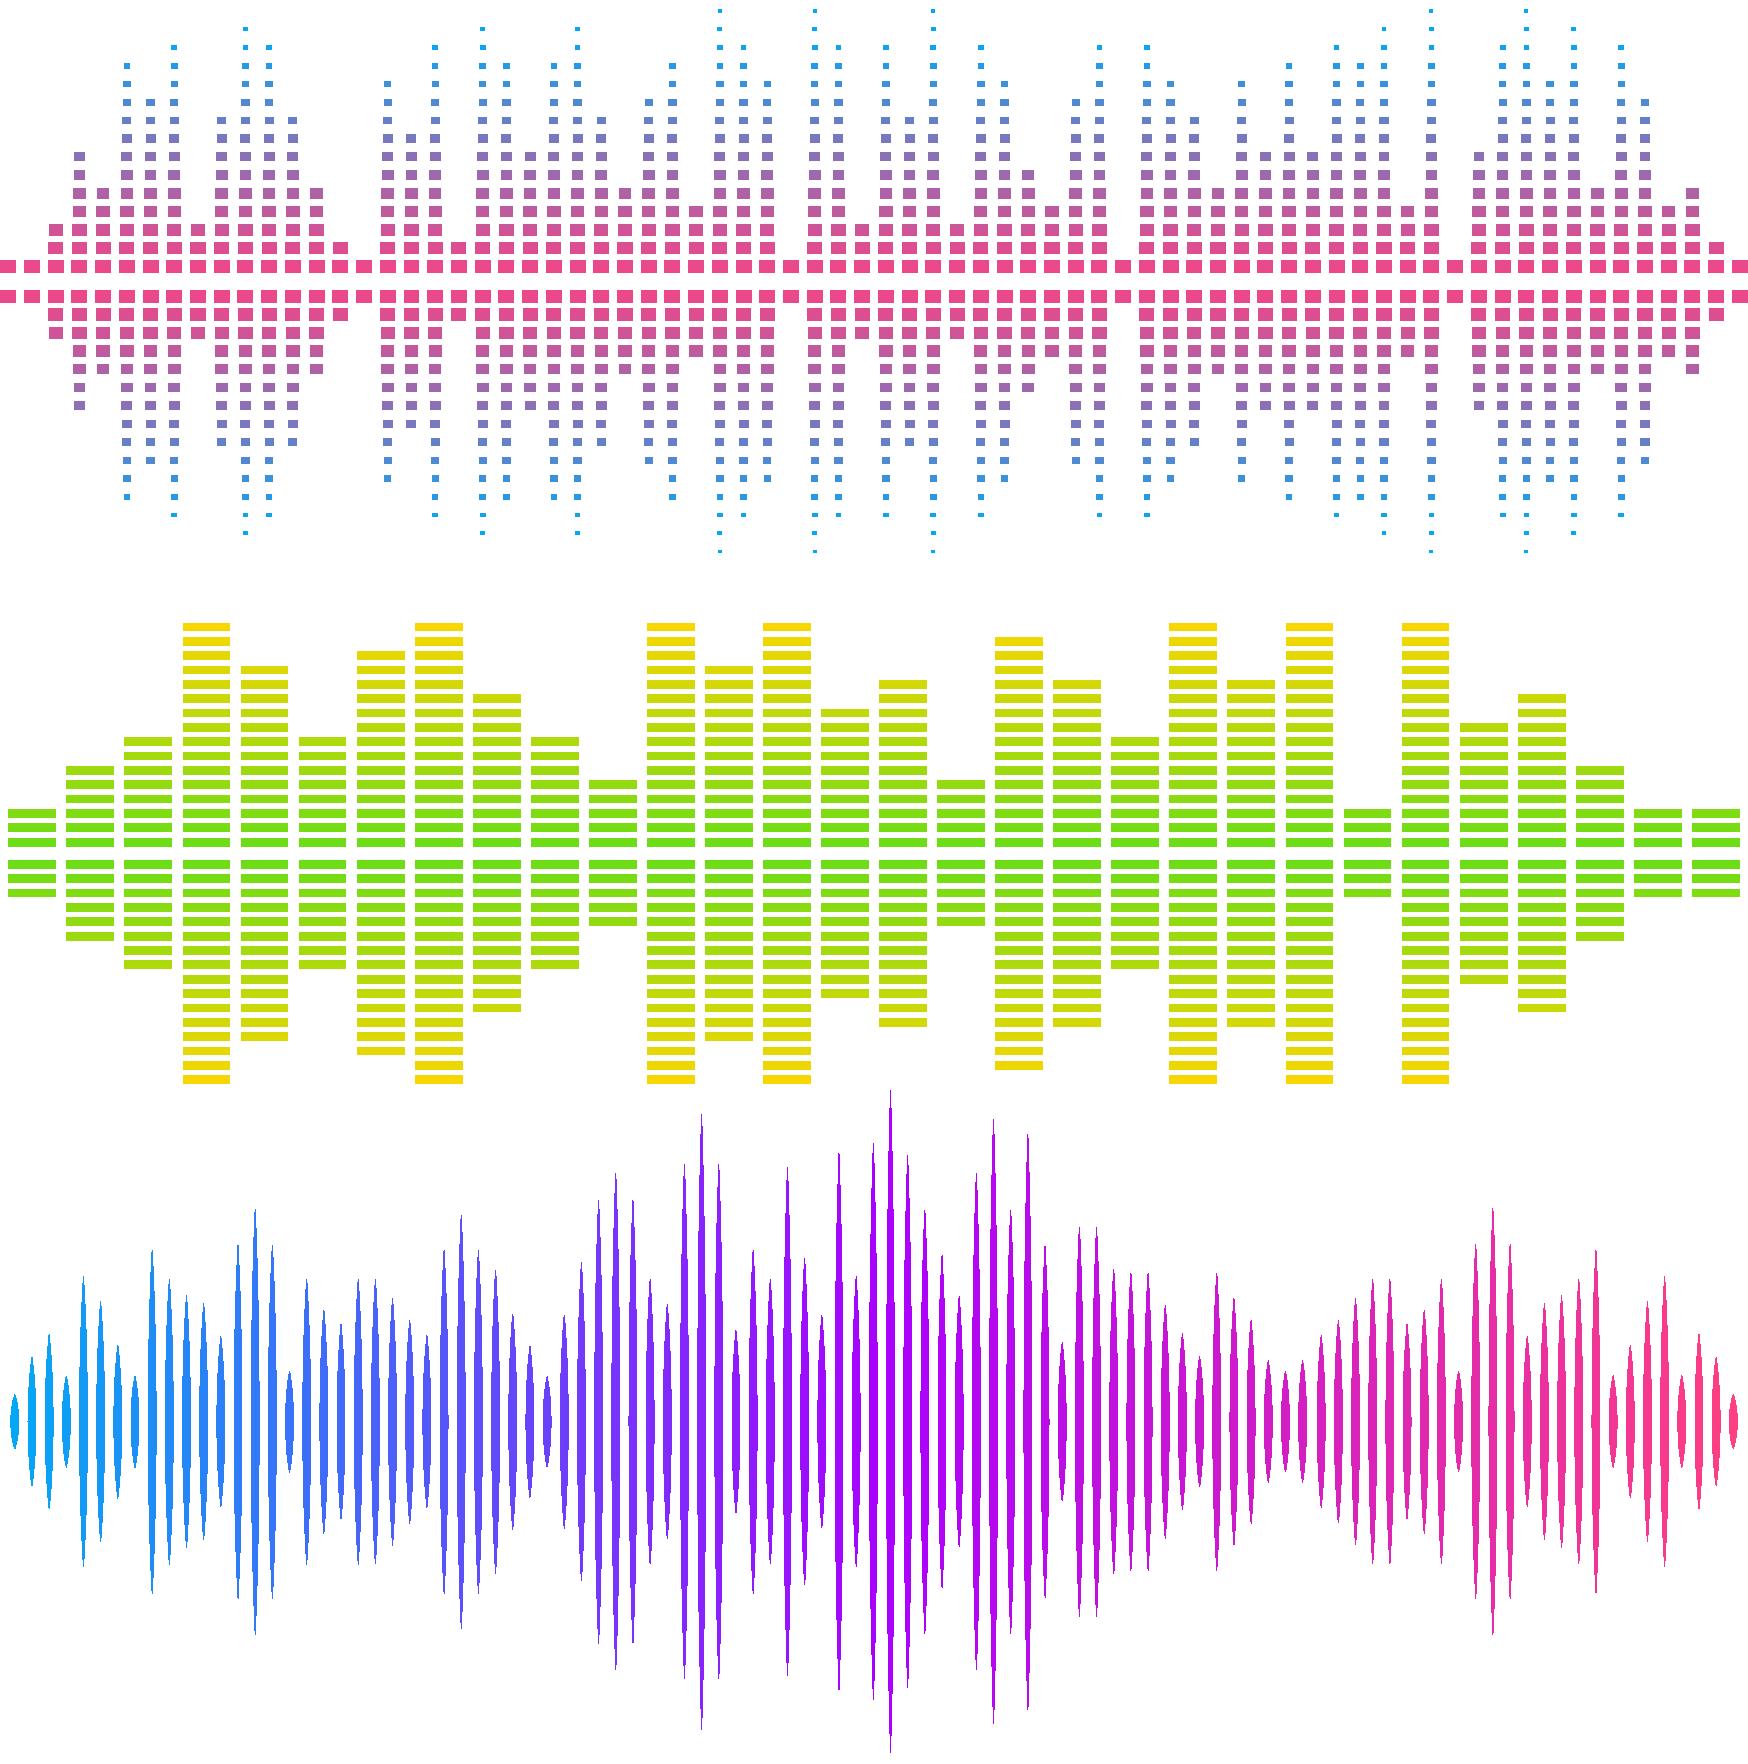 Music Bar sound waves PNG HD image free download